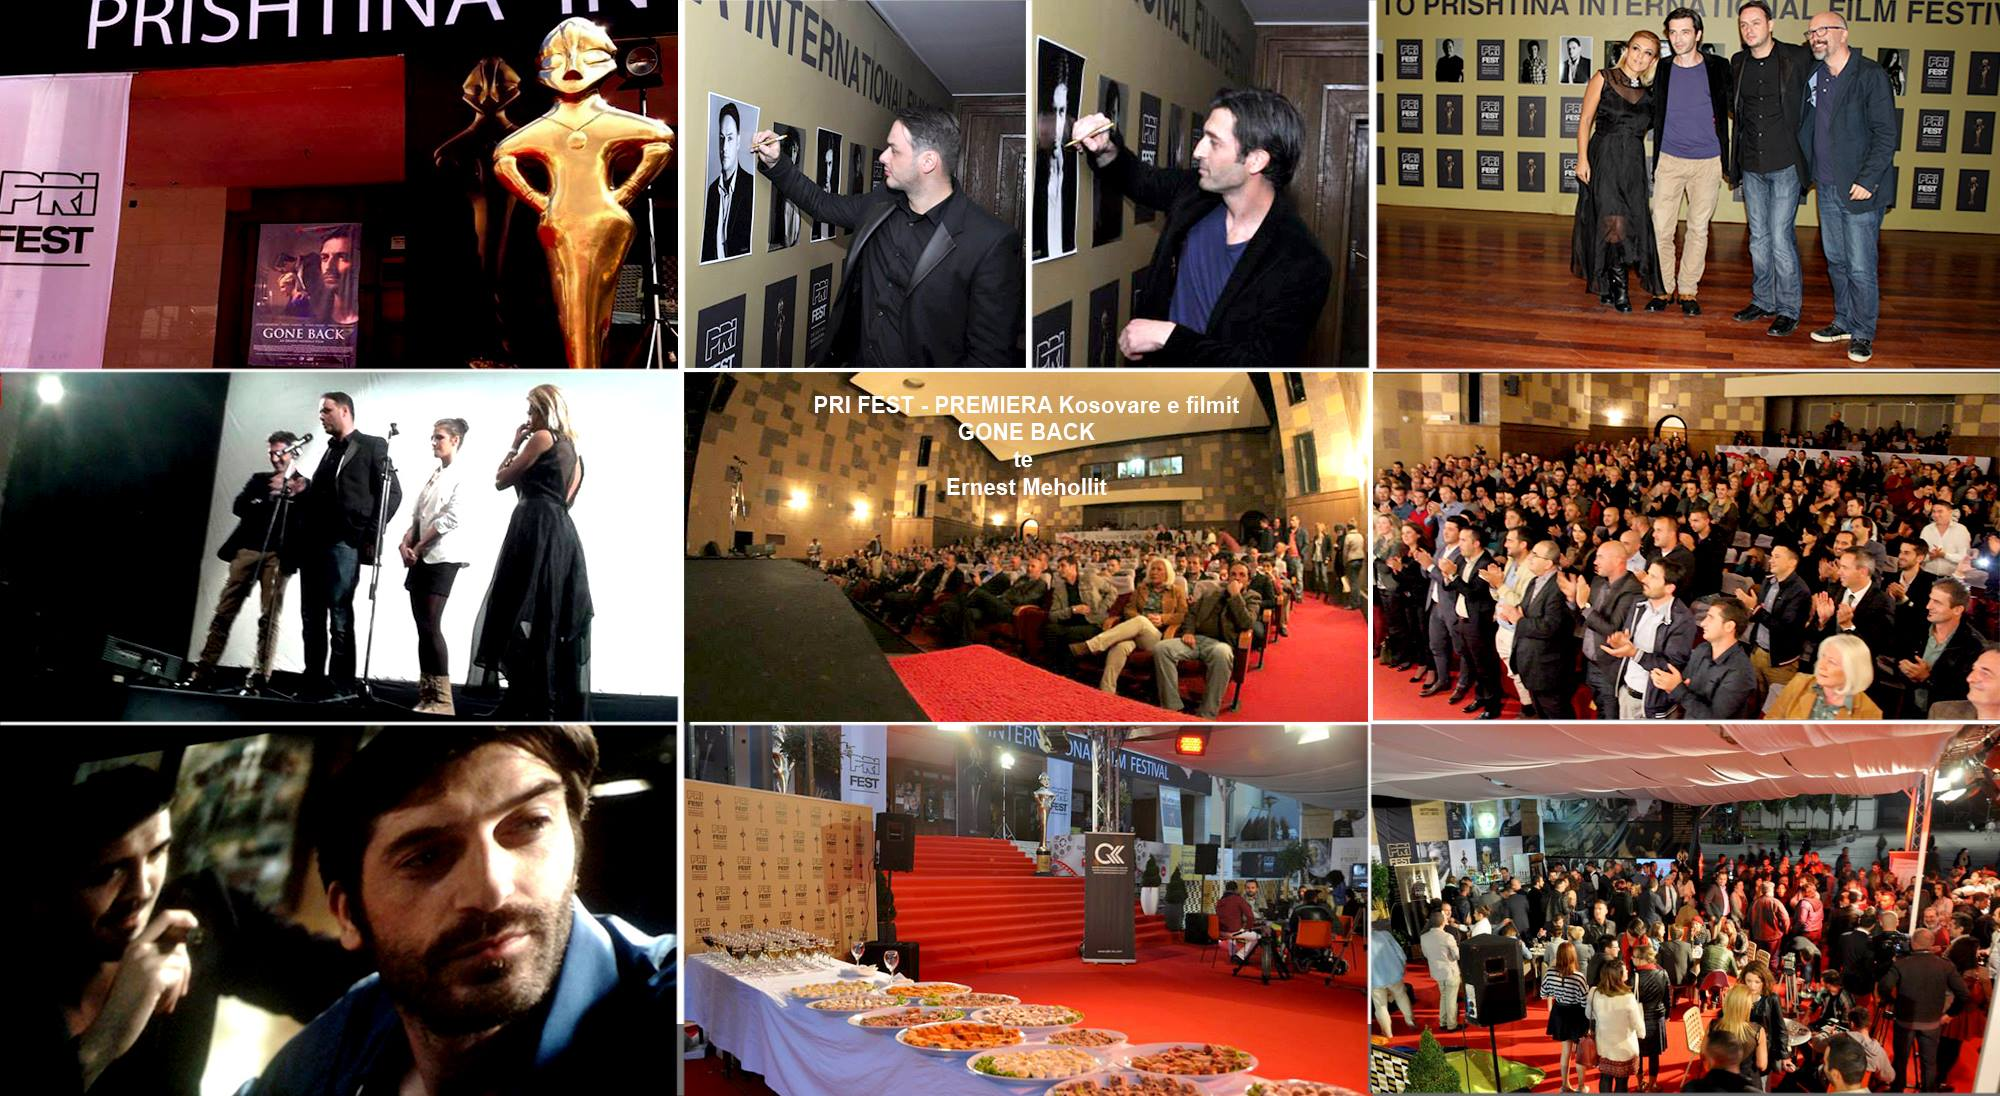 Ernest Meholli Astrit Alihajdaraj Blerim Destani Hanna Verboom Audience Award publiks prijs qmimin e publikut prifest prishtine